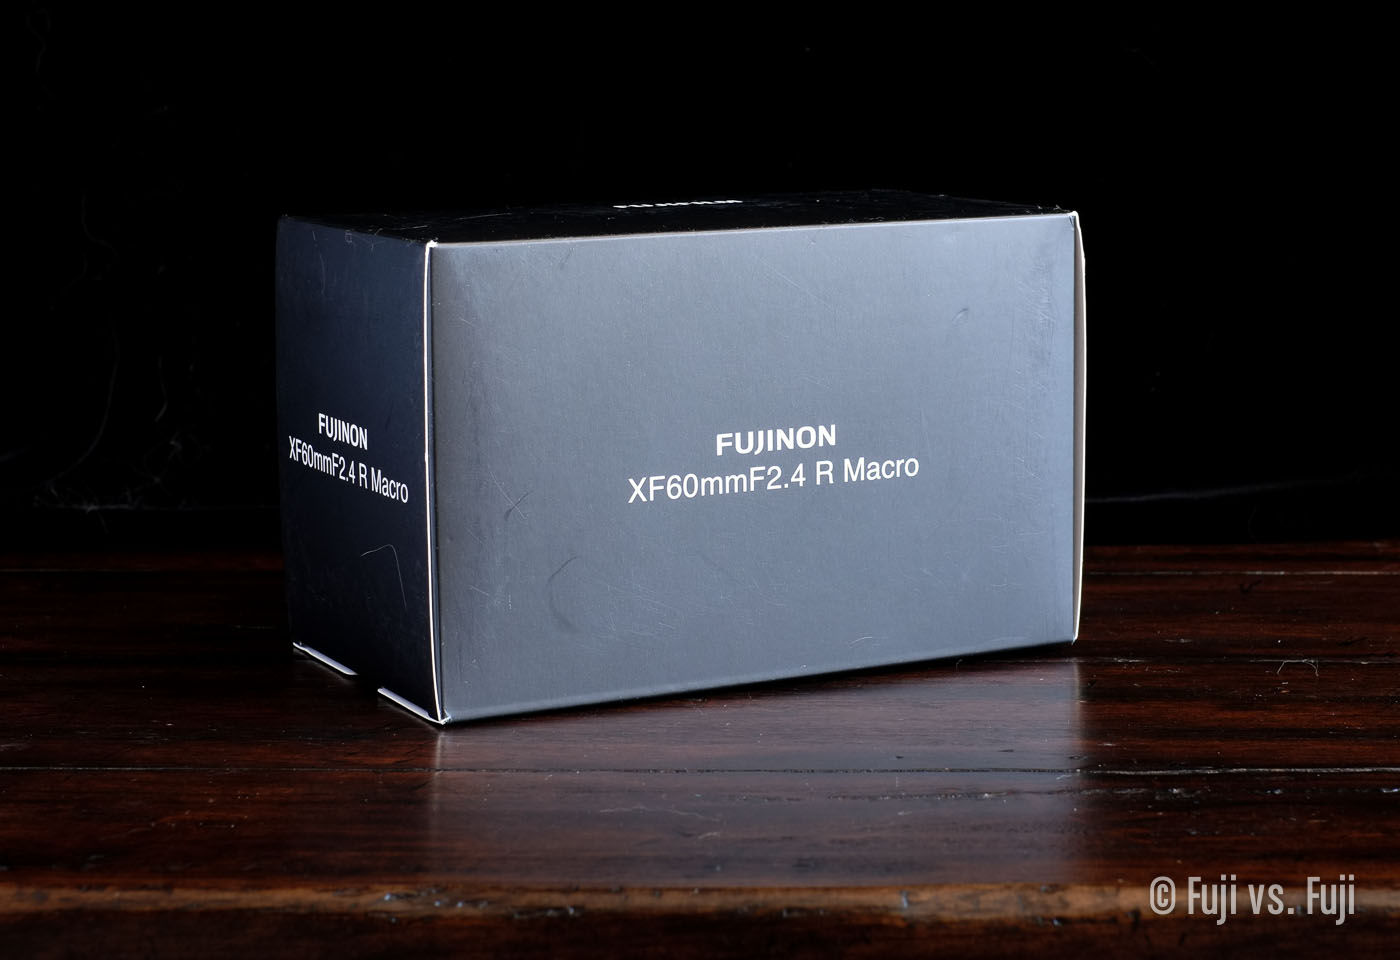 TheFUJINON XF 60mm f/2.4 Macro old-style box design enclosure